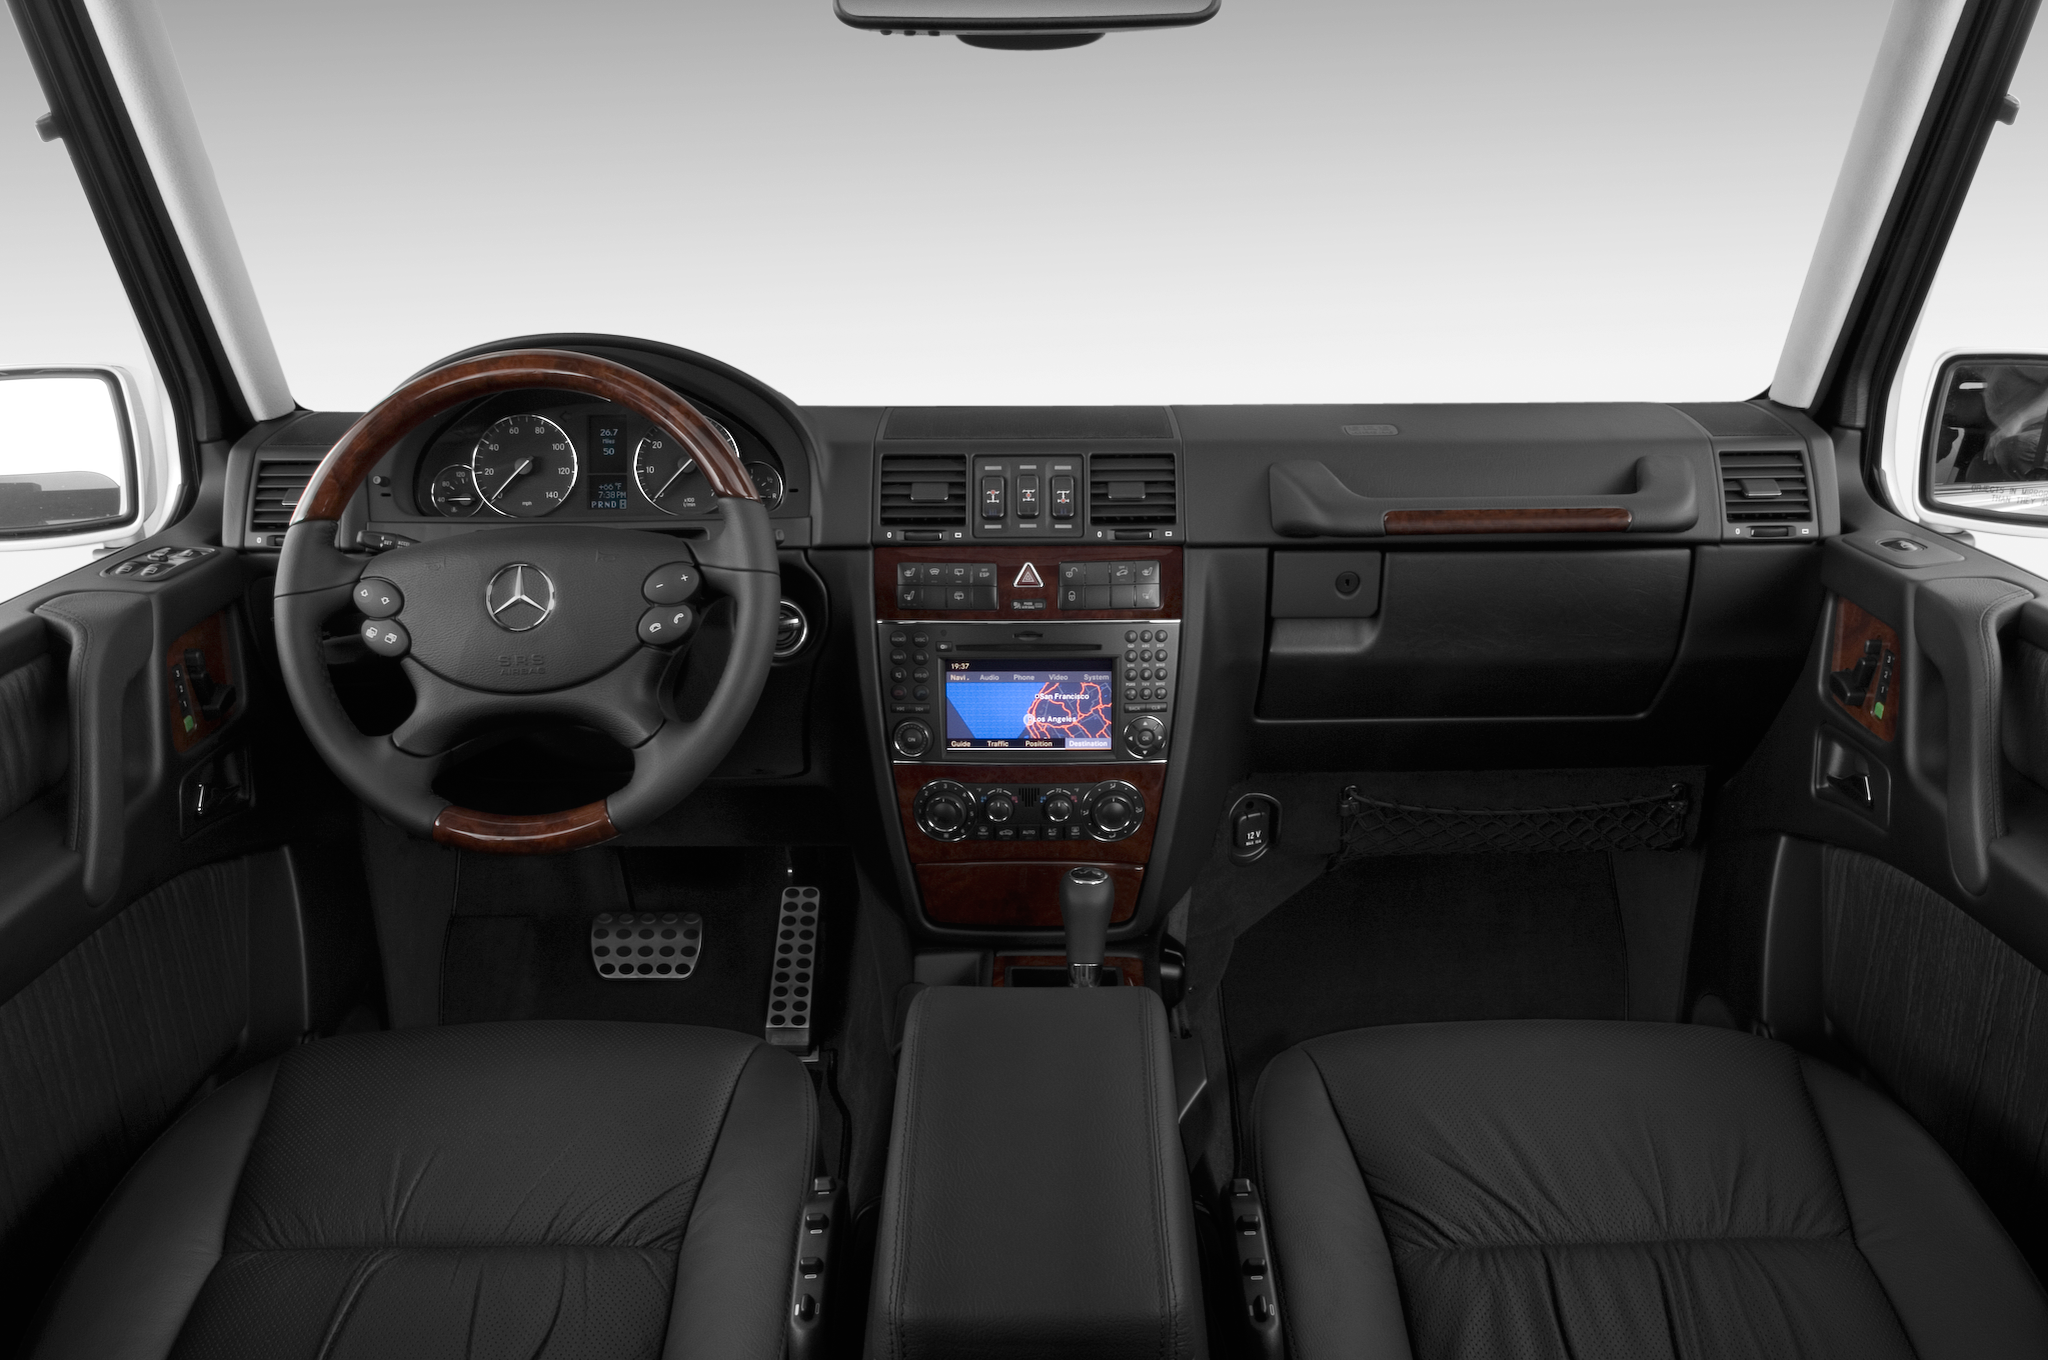 Spied mercedes benz g55 amg gains mild facelift for Mercedes benz dashboard